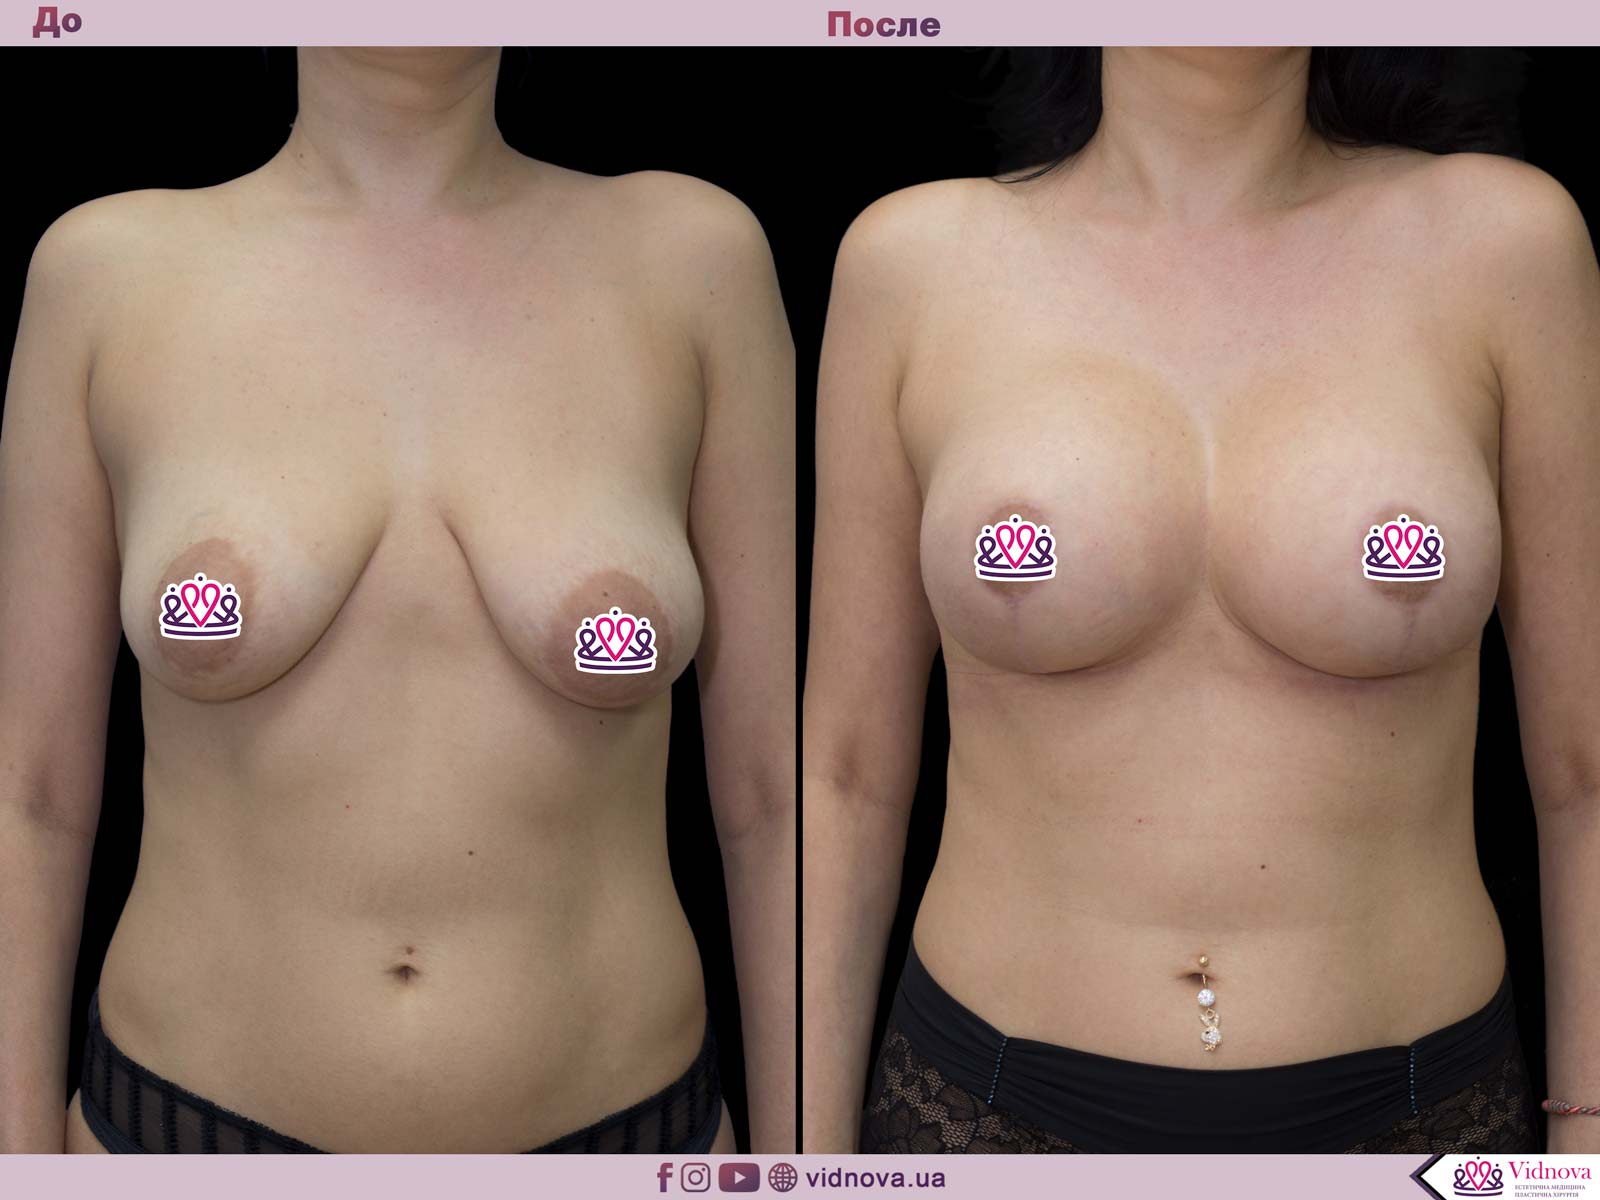 Подтяжка груди: Фото ДО и ПОСЛЕ - Пример №22-1 - Клиника Vidnova